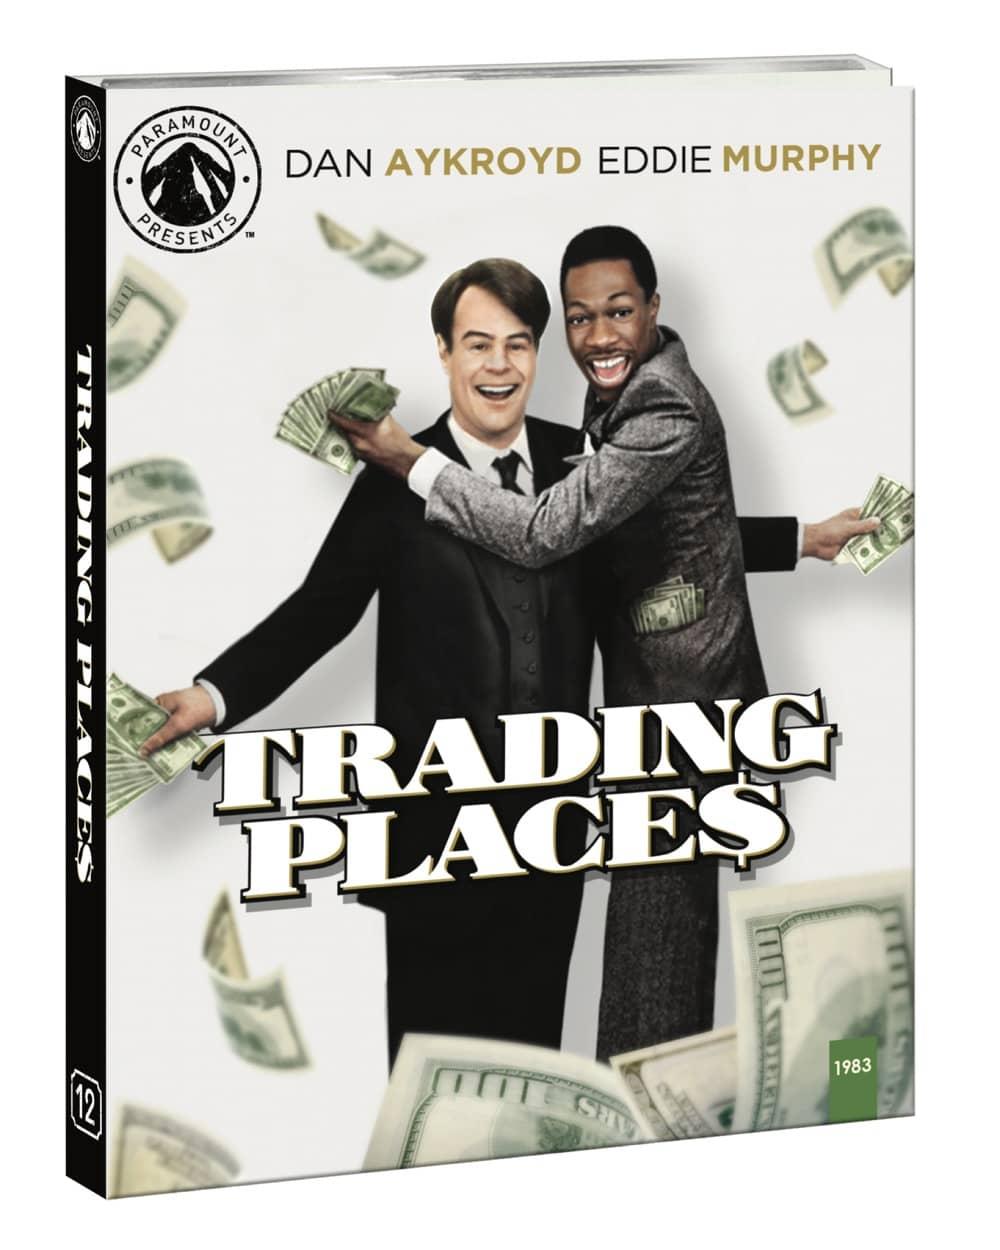 TradingPlaces PP BRD 3D Oslv